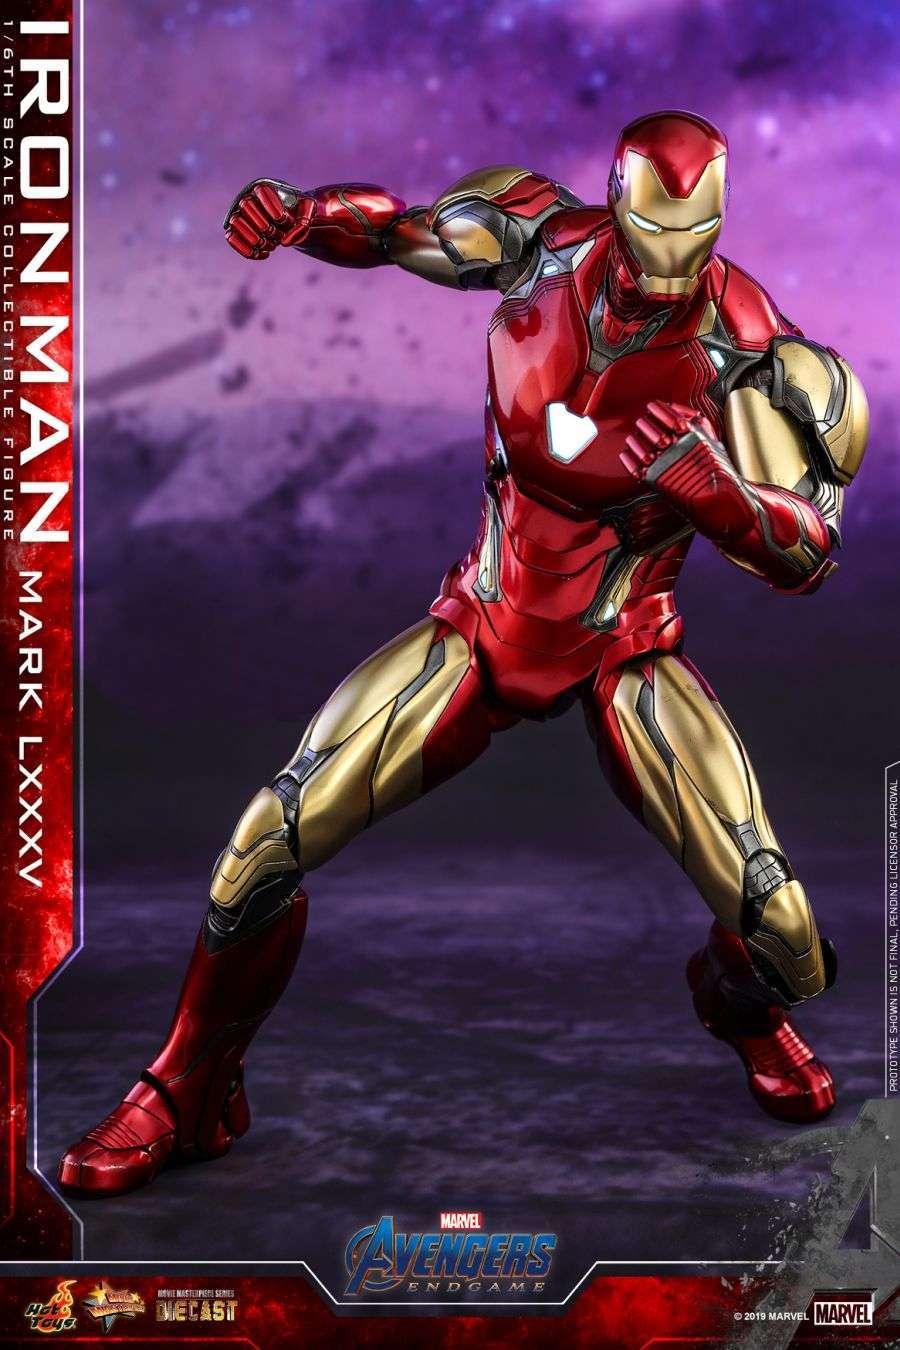 Hot Toys - Avengers 4 - Iron Man Mark LXXXV collectible figure_PR5